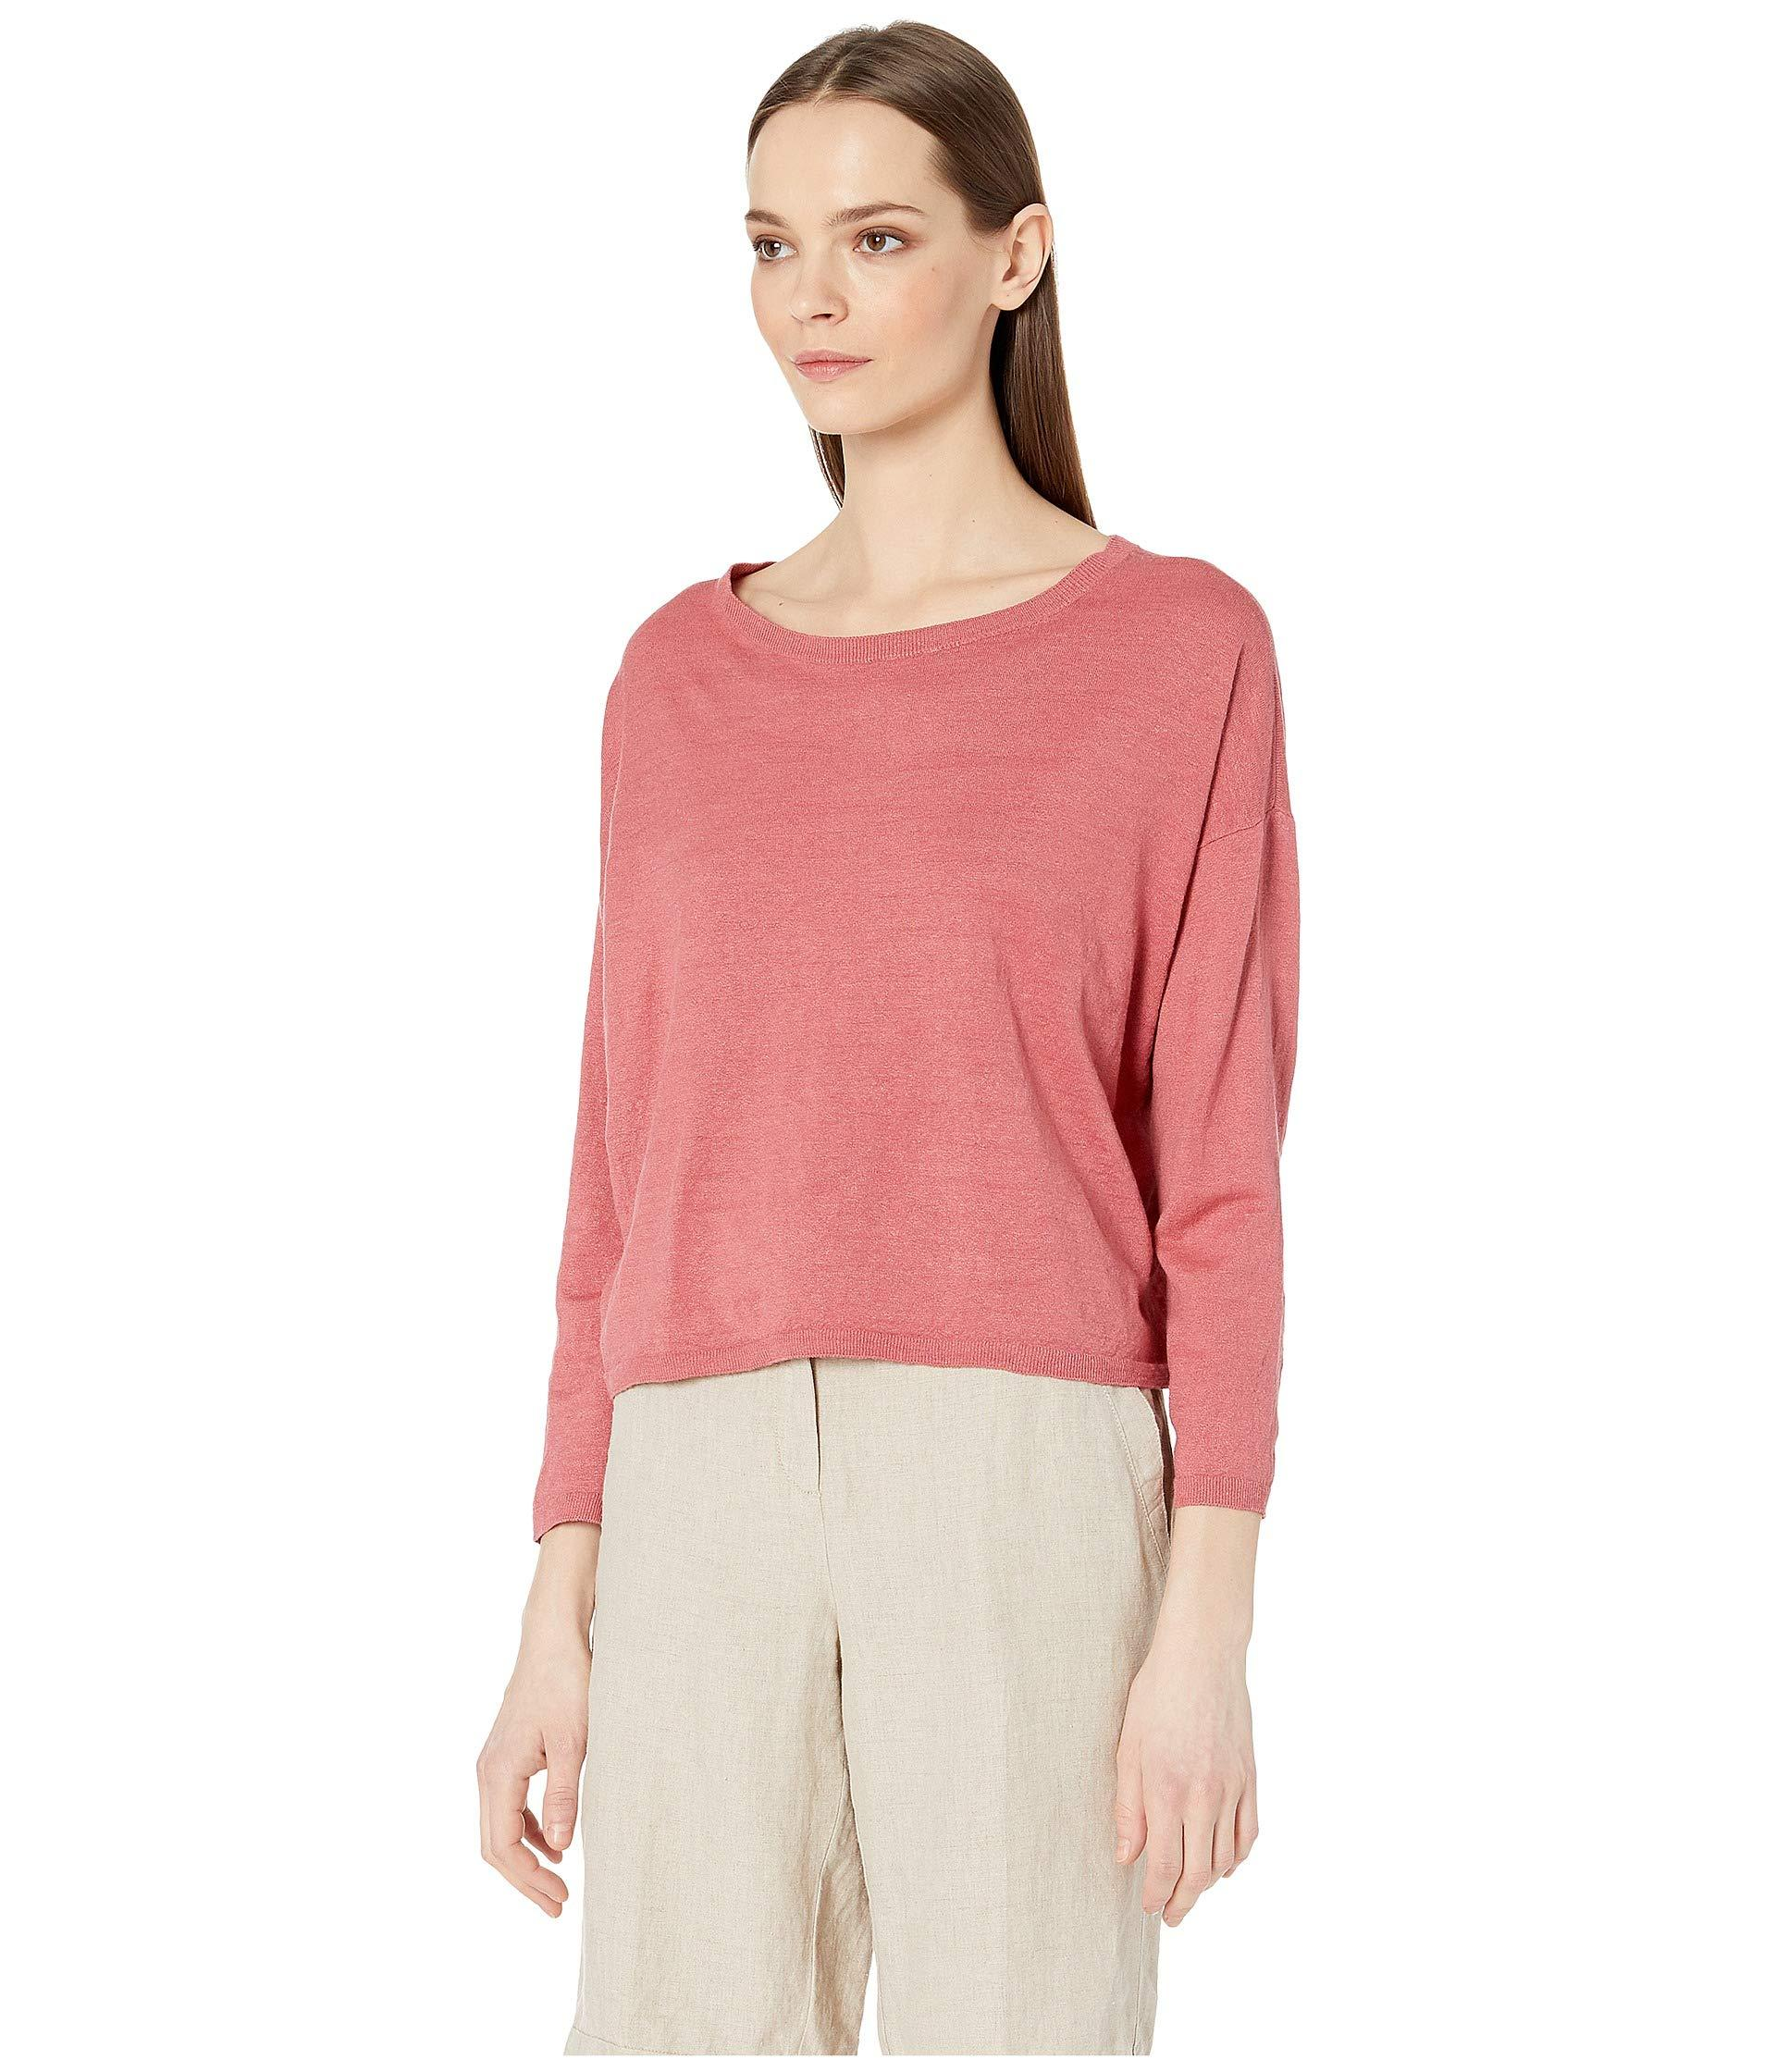 fc6de846657dc7 Lyst - Eileen Fisher Organic Linen Crepe Stretch Jewel Neck Box-top (black)  Women s Clothing in Pink